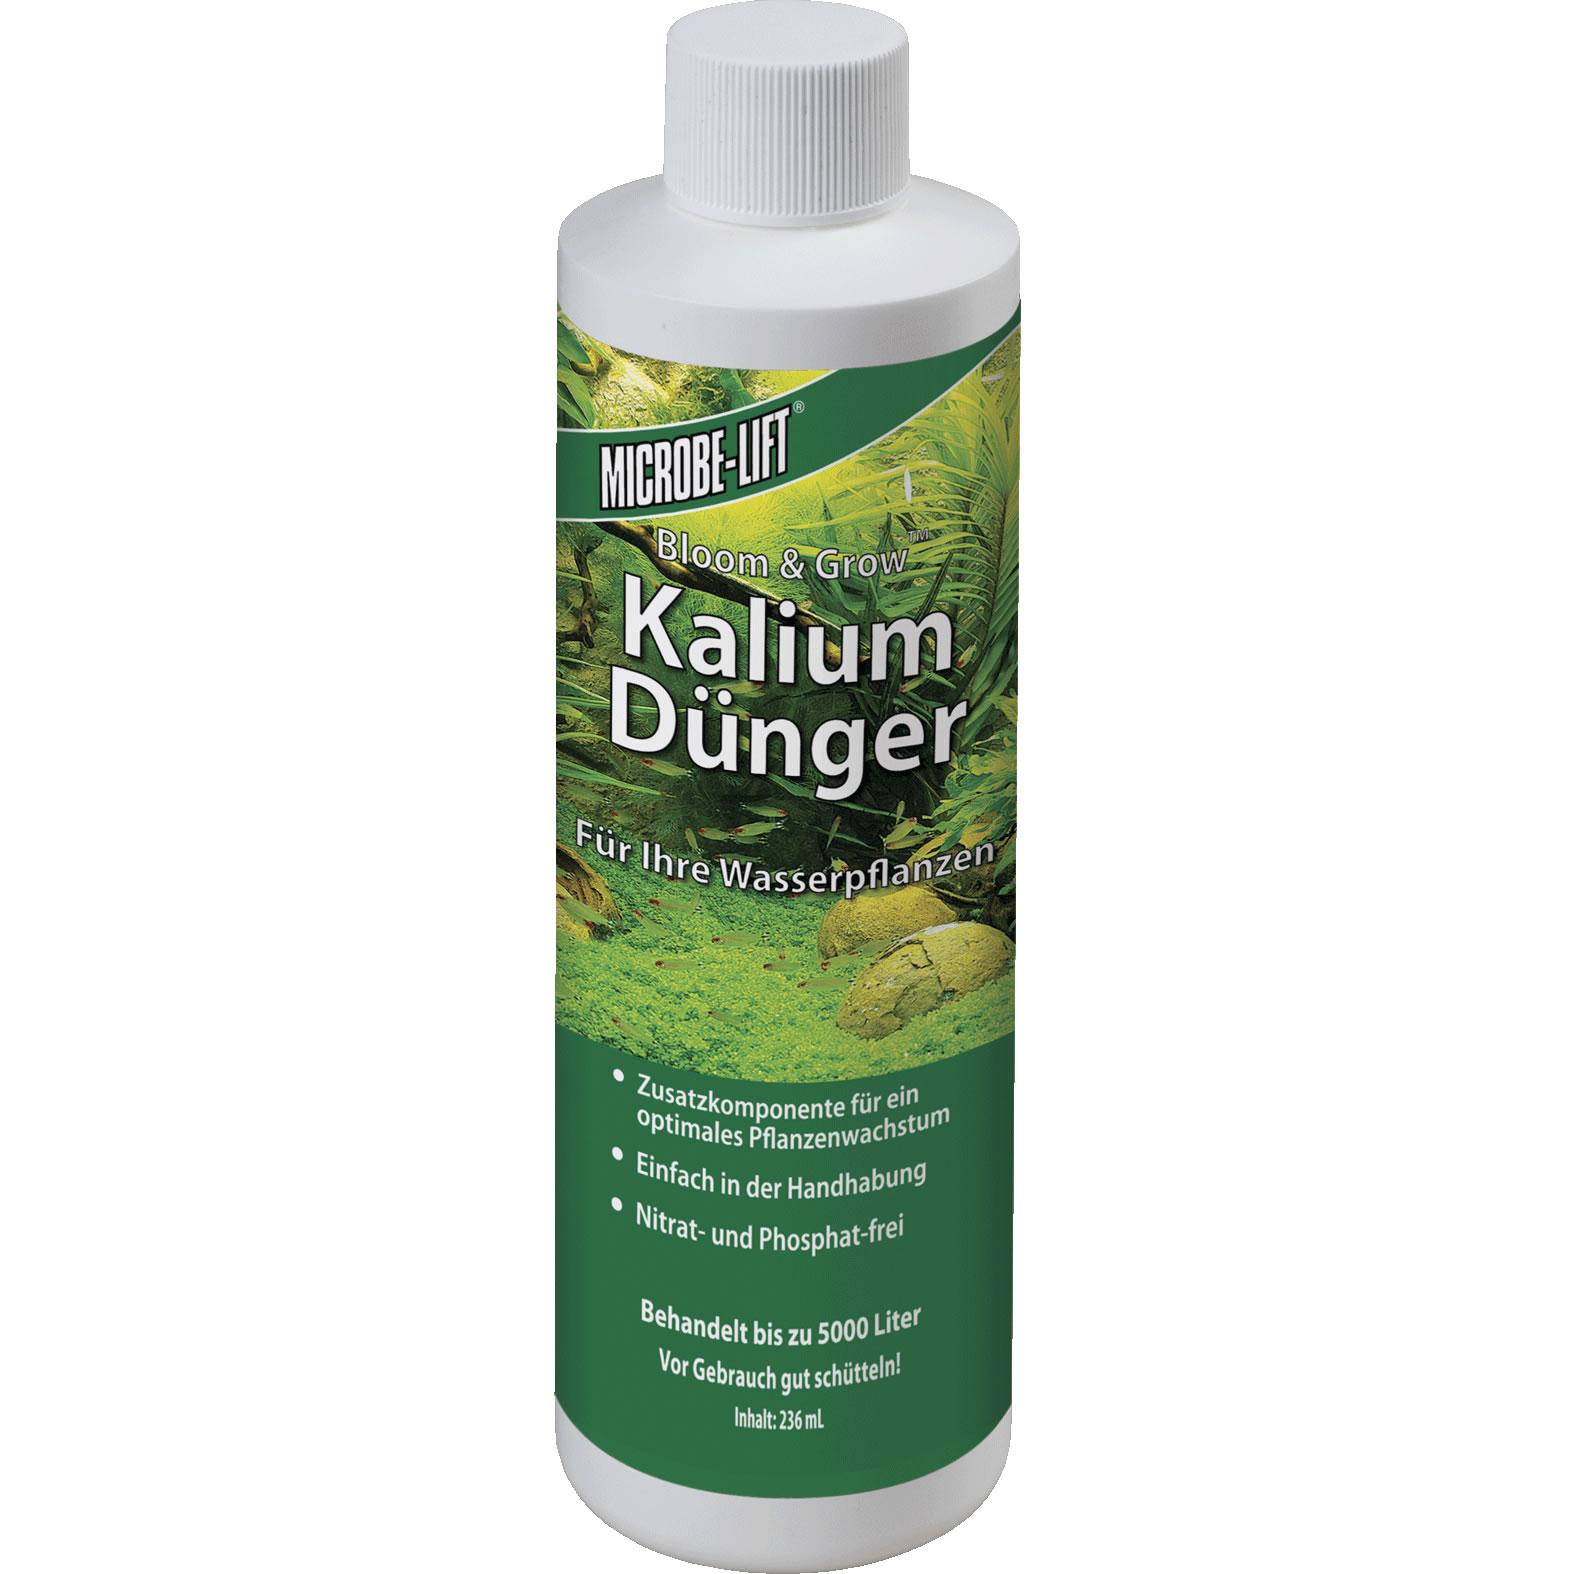 MICROBE-LIFT Bloom&Grow Potassium - (Kalium)